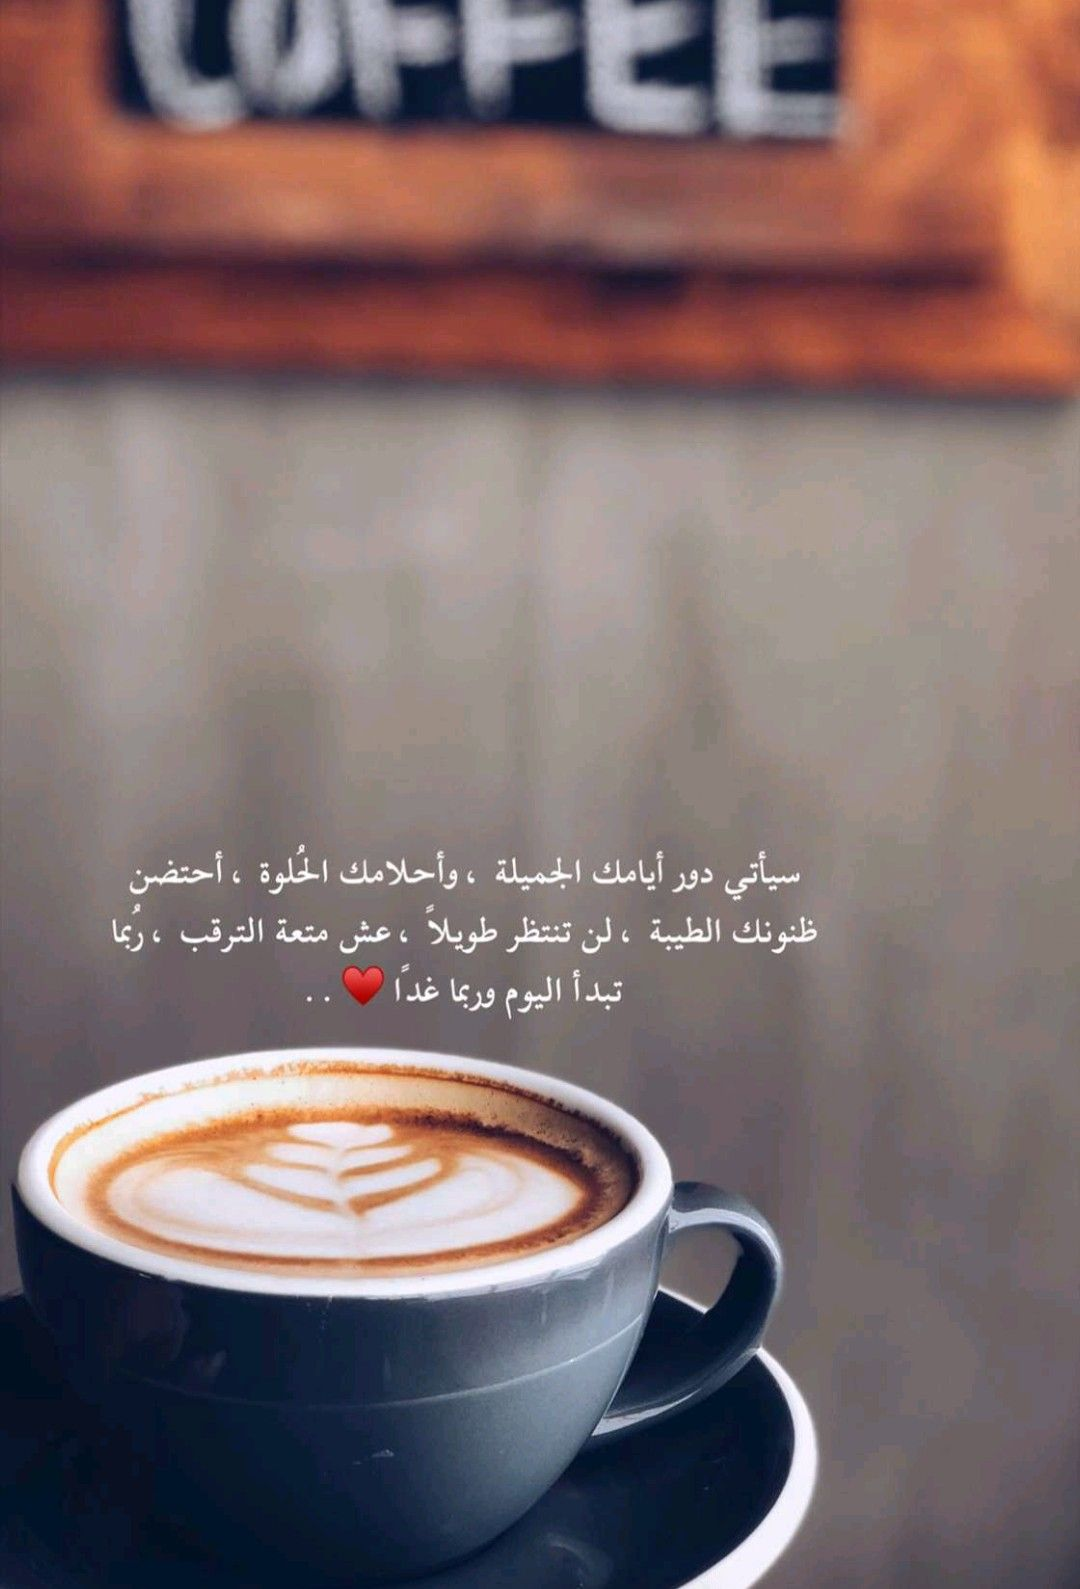 Citaten Koffie English : الحمدلله ⚘ اللهم آمين arabic love quotes arabic english quotes